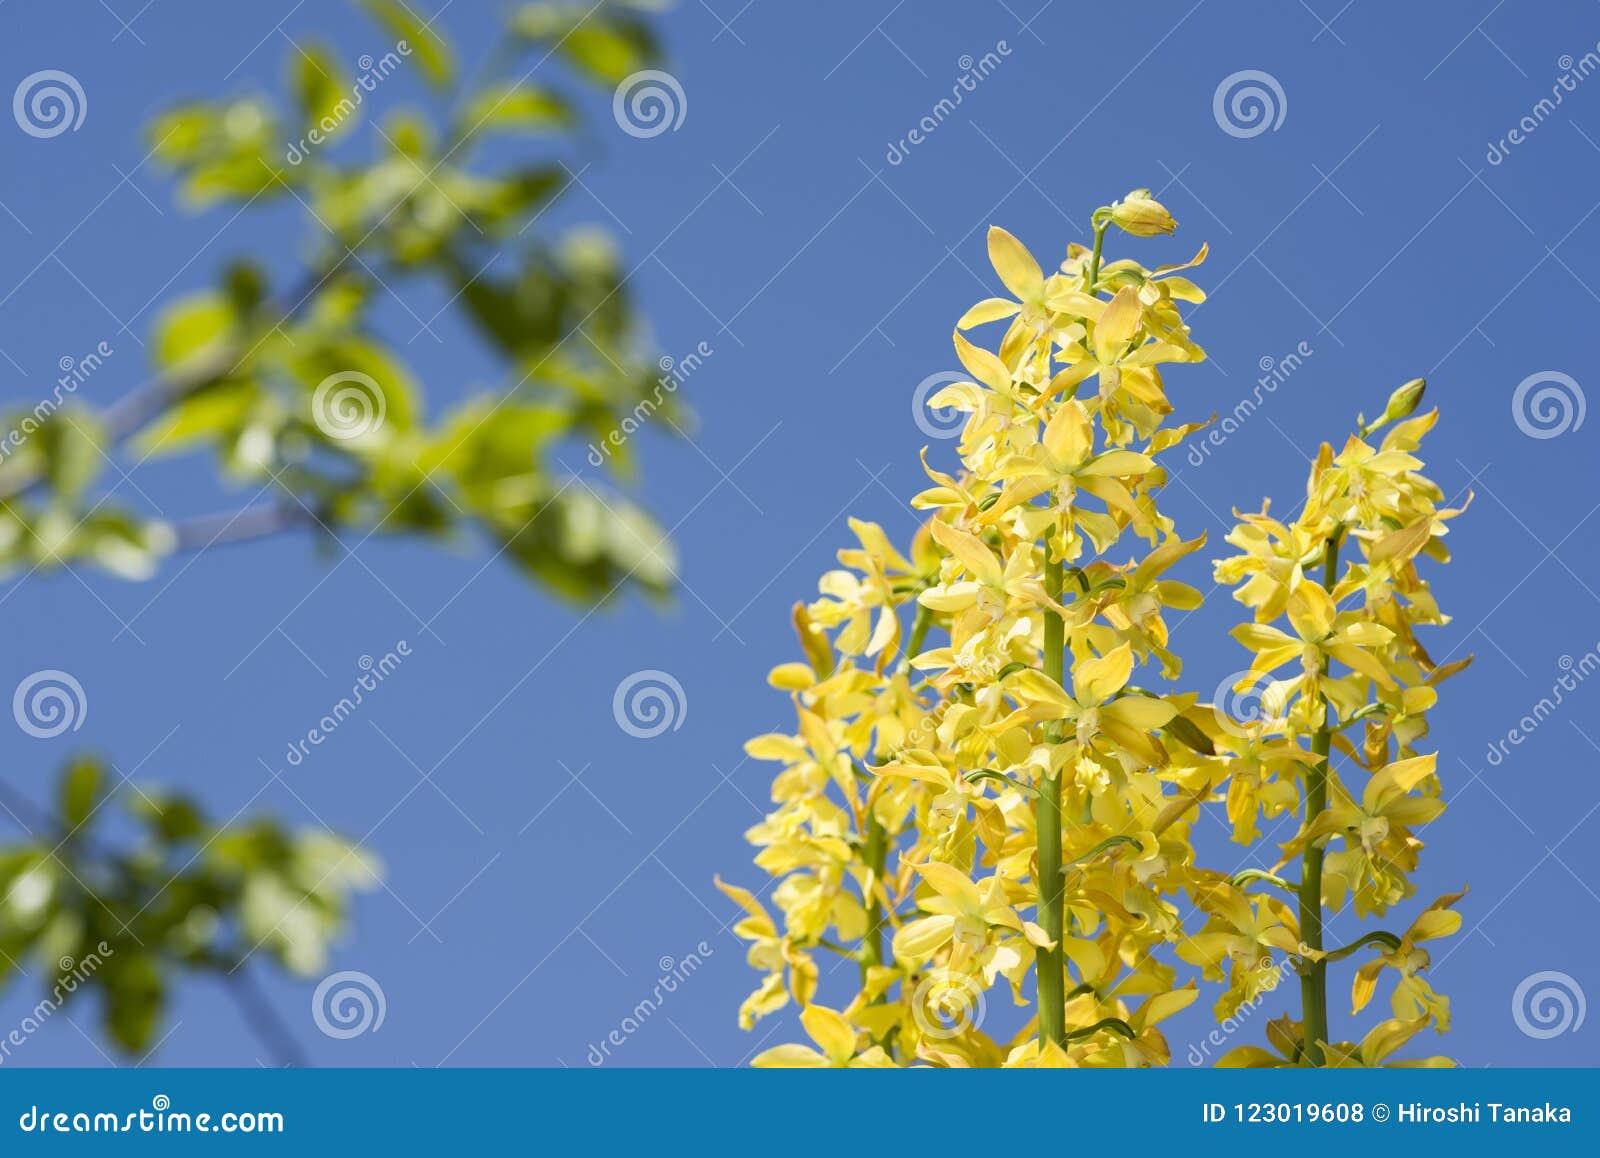 Yellow calanthe flowers